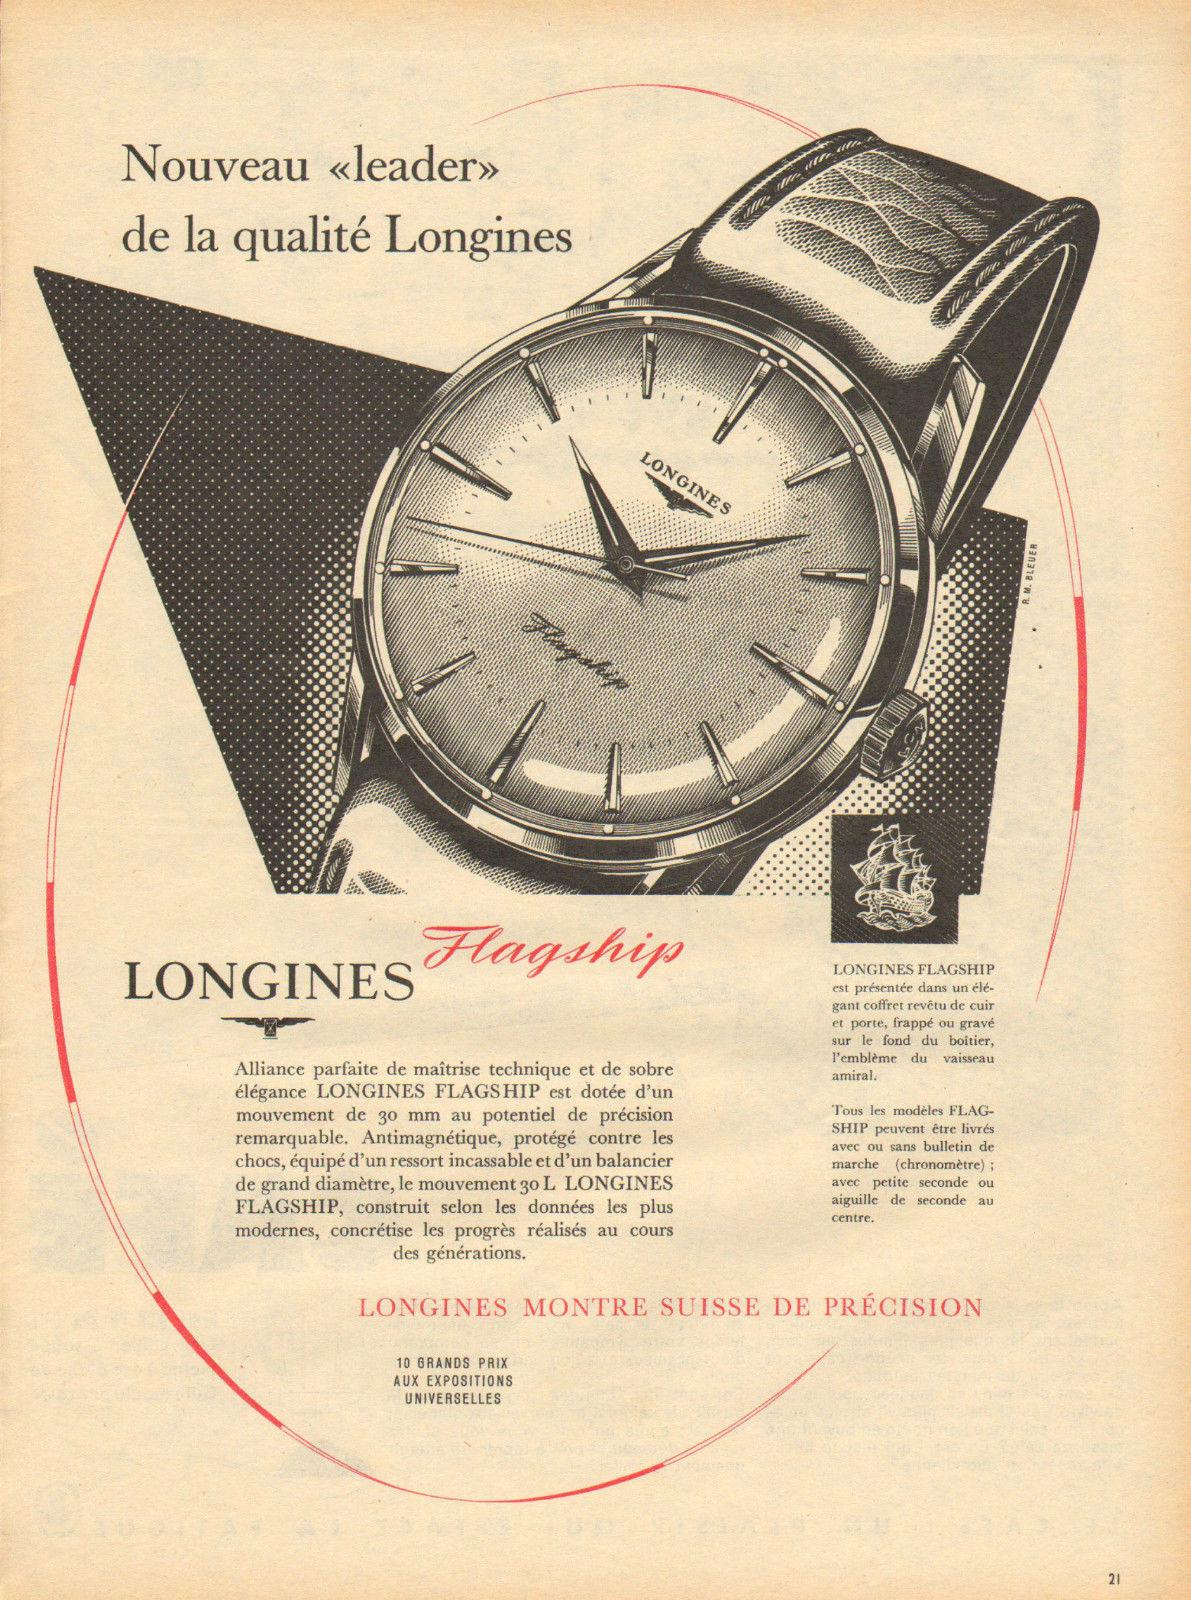 Publicidad Longines Flagship 1959